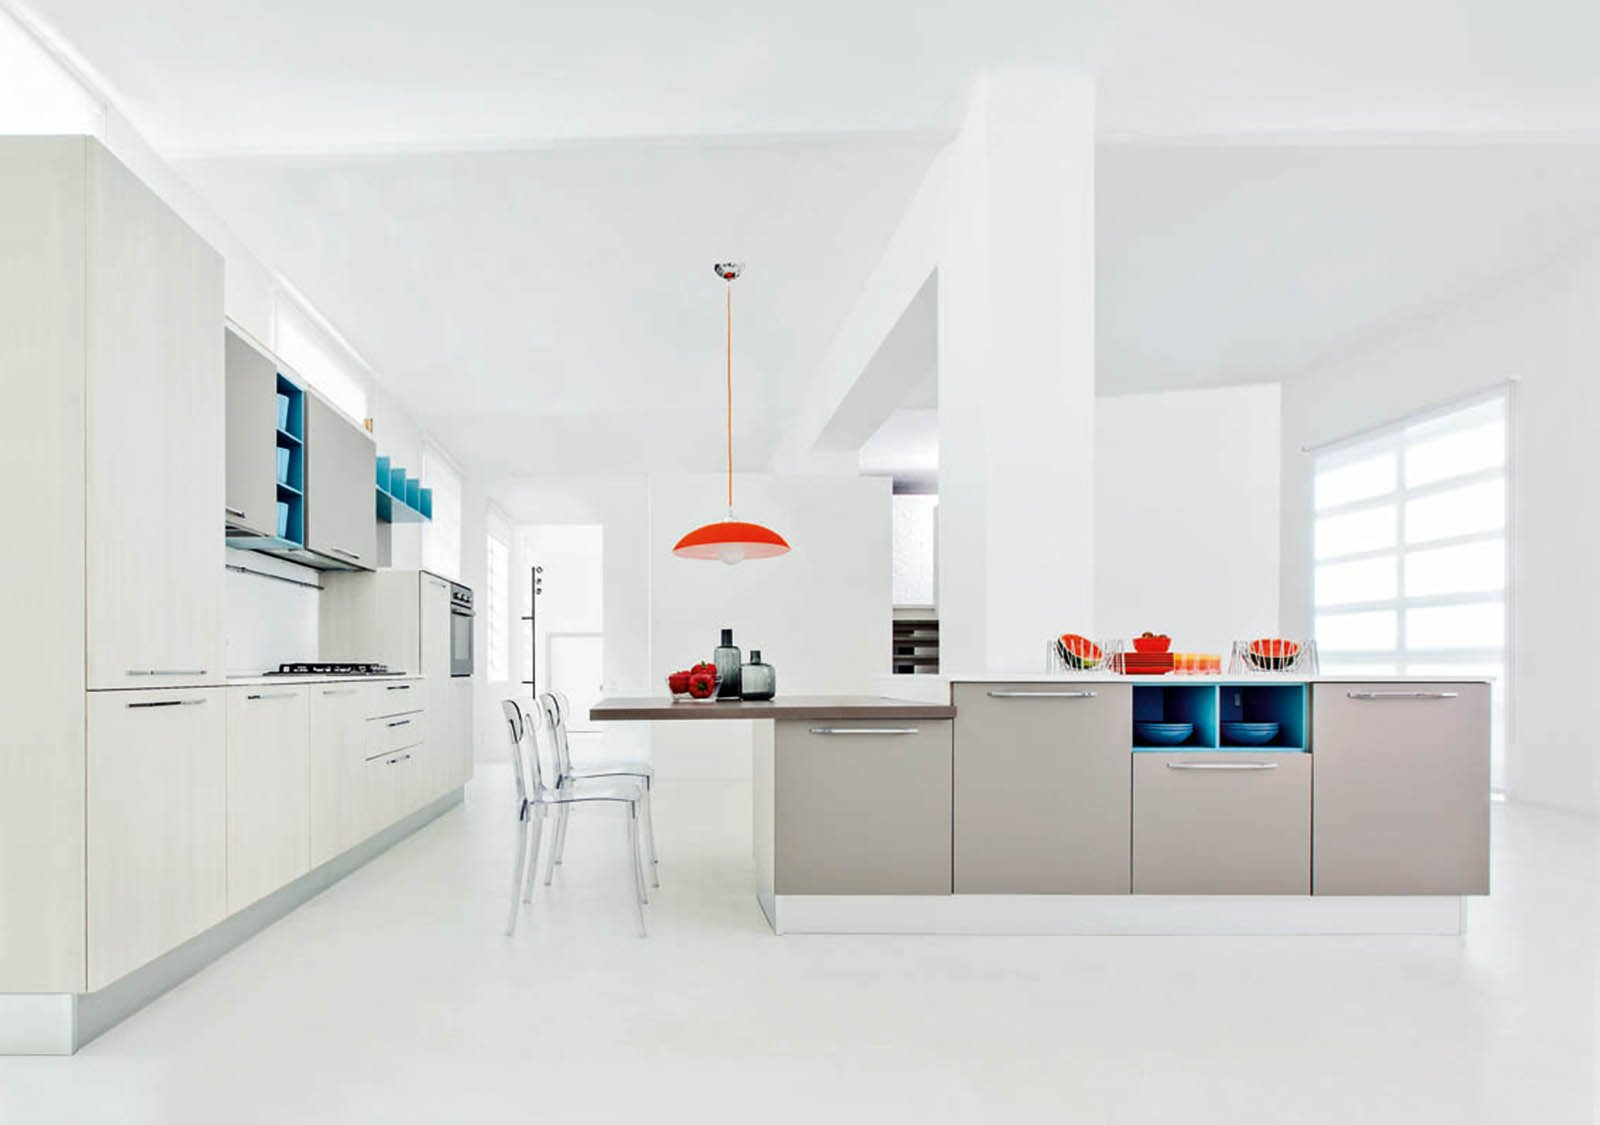 Misure mobili cucina disegnare cucina angolare online - Disegnare cucina ikea ...